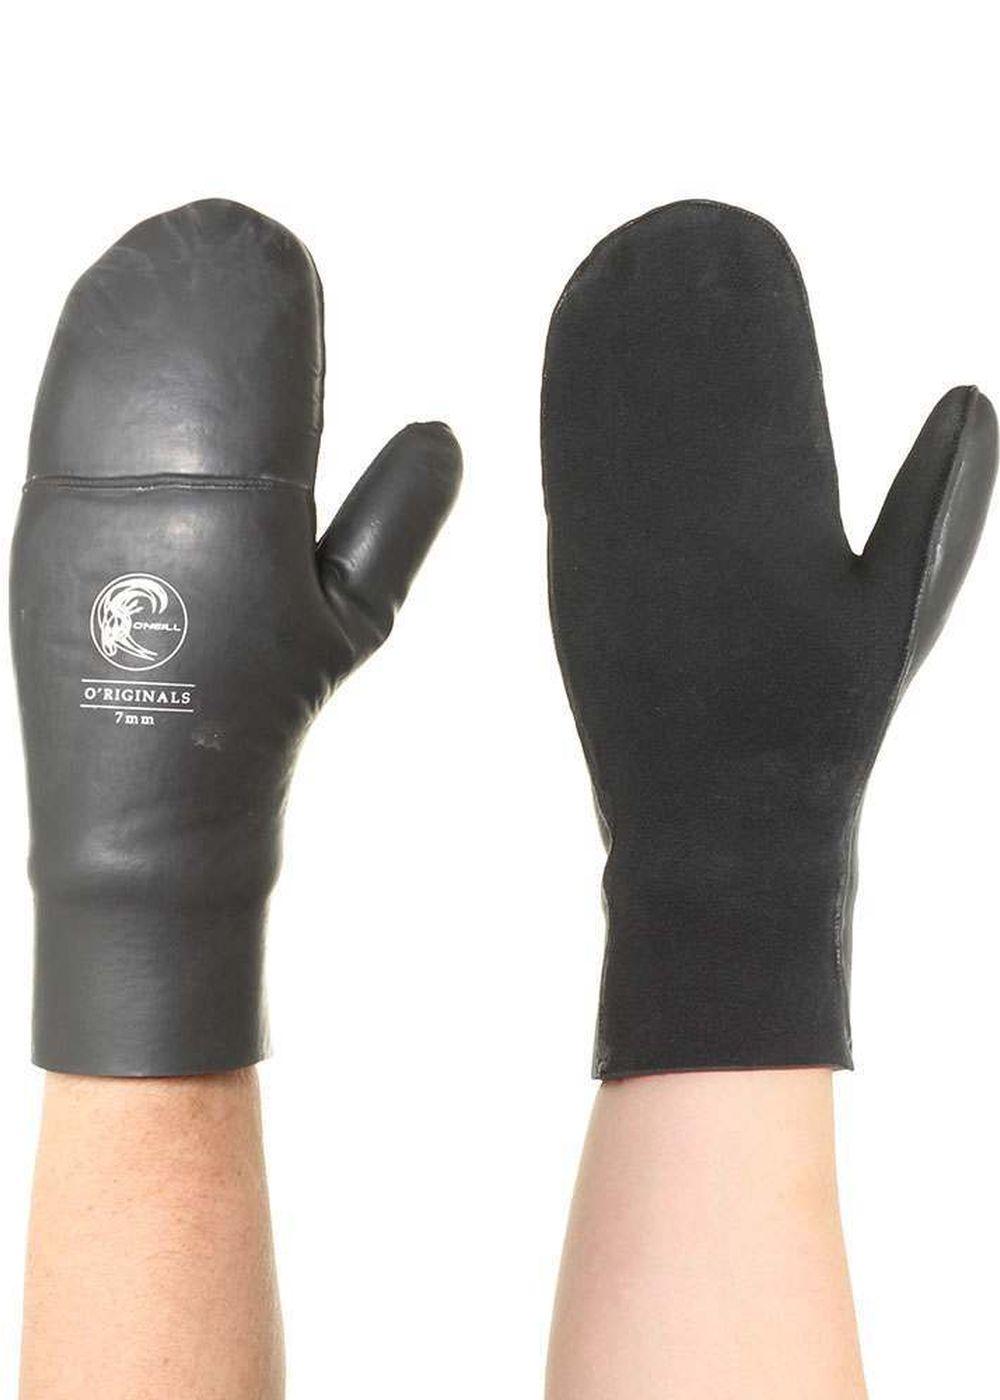 Oneill Originals 7mm Dipped Mitt Wetsuit Gloves Picture